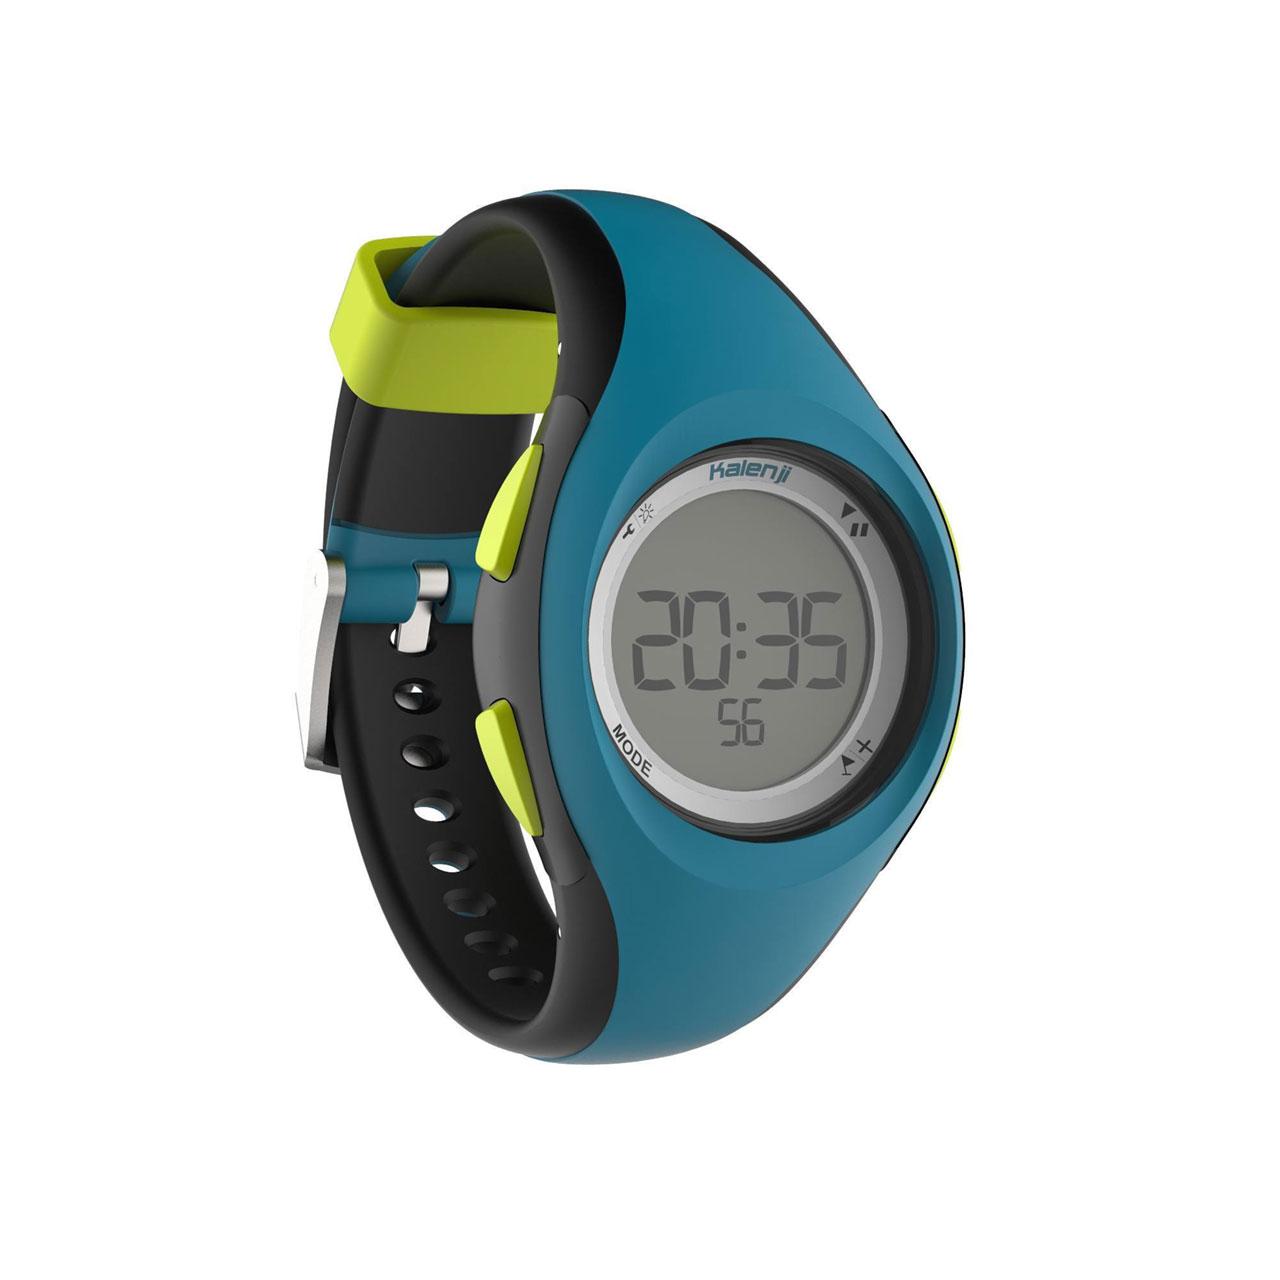 خرید ساعت مچی دیجیتال دکتلون مدل W200